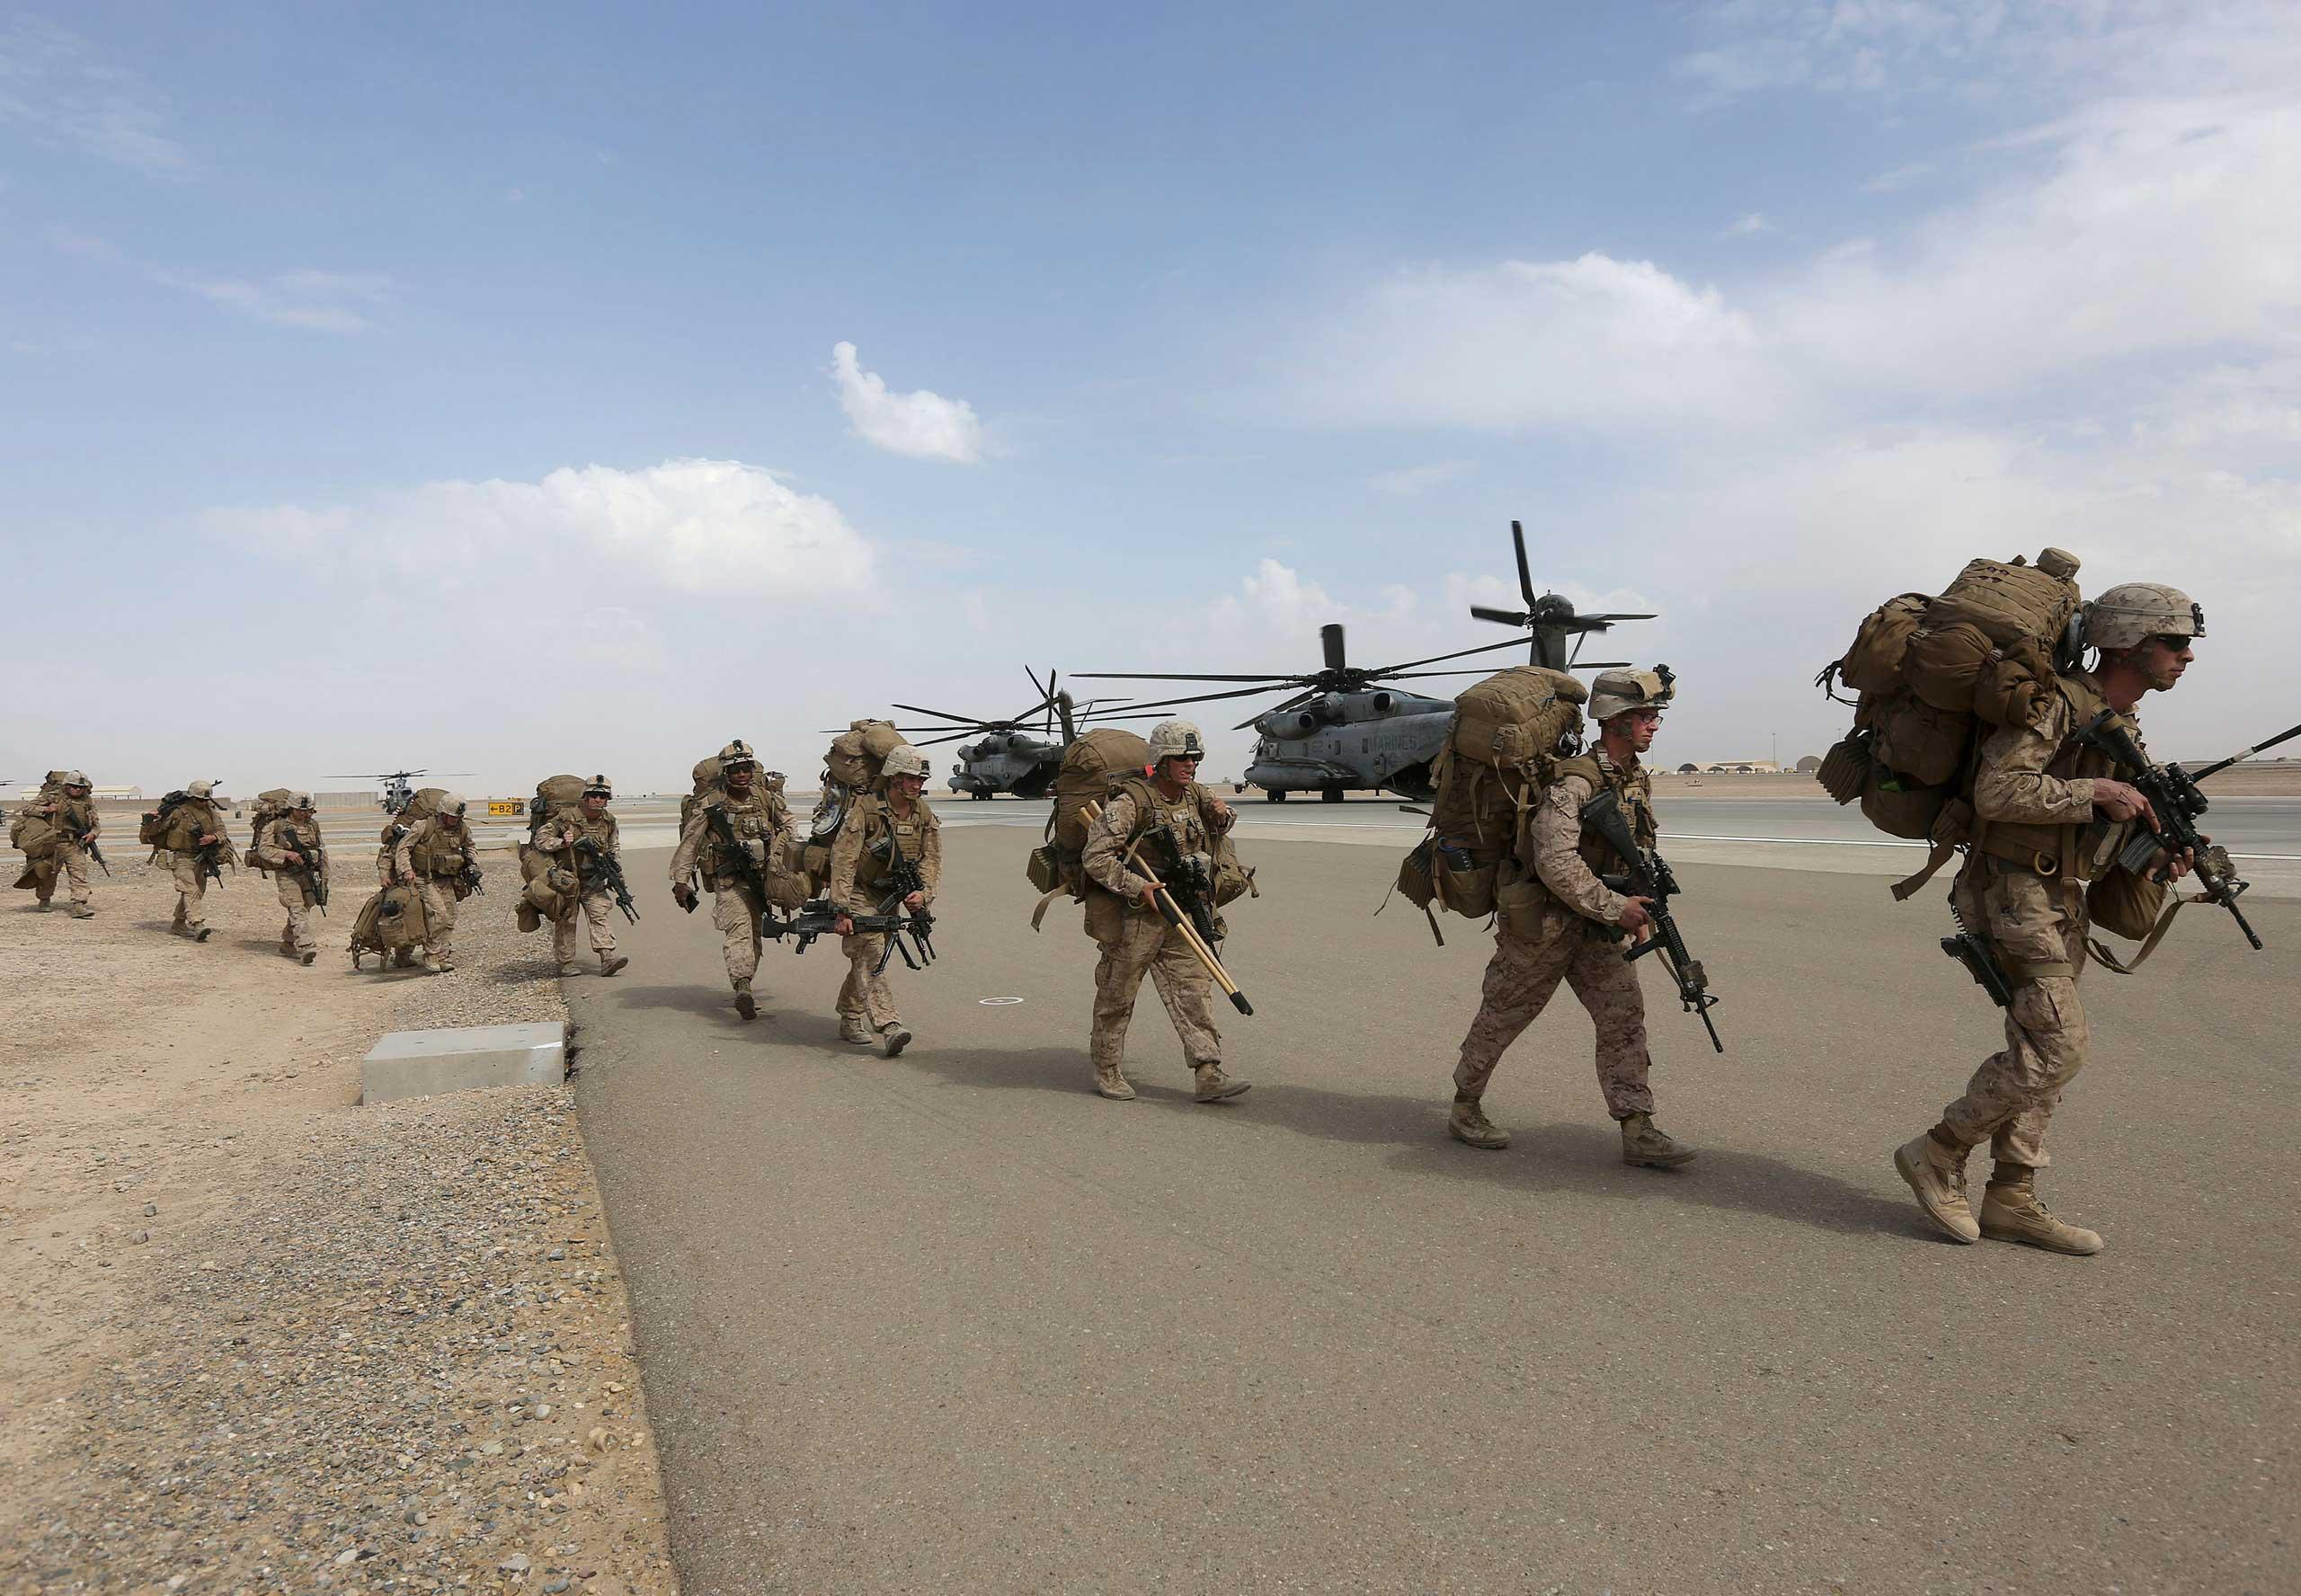 U.S. Marines prepare to depart Helmand Province, Afghanistan on Oct. 27, 2014.